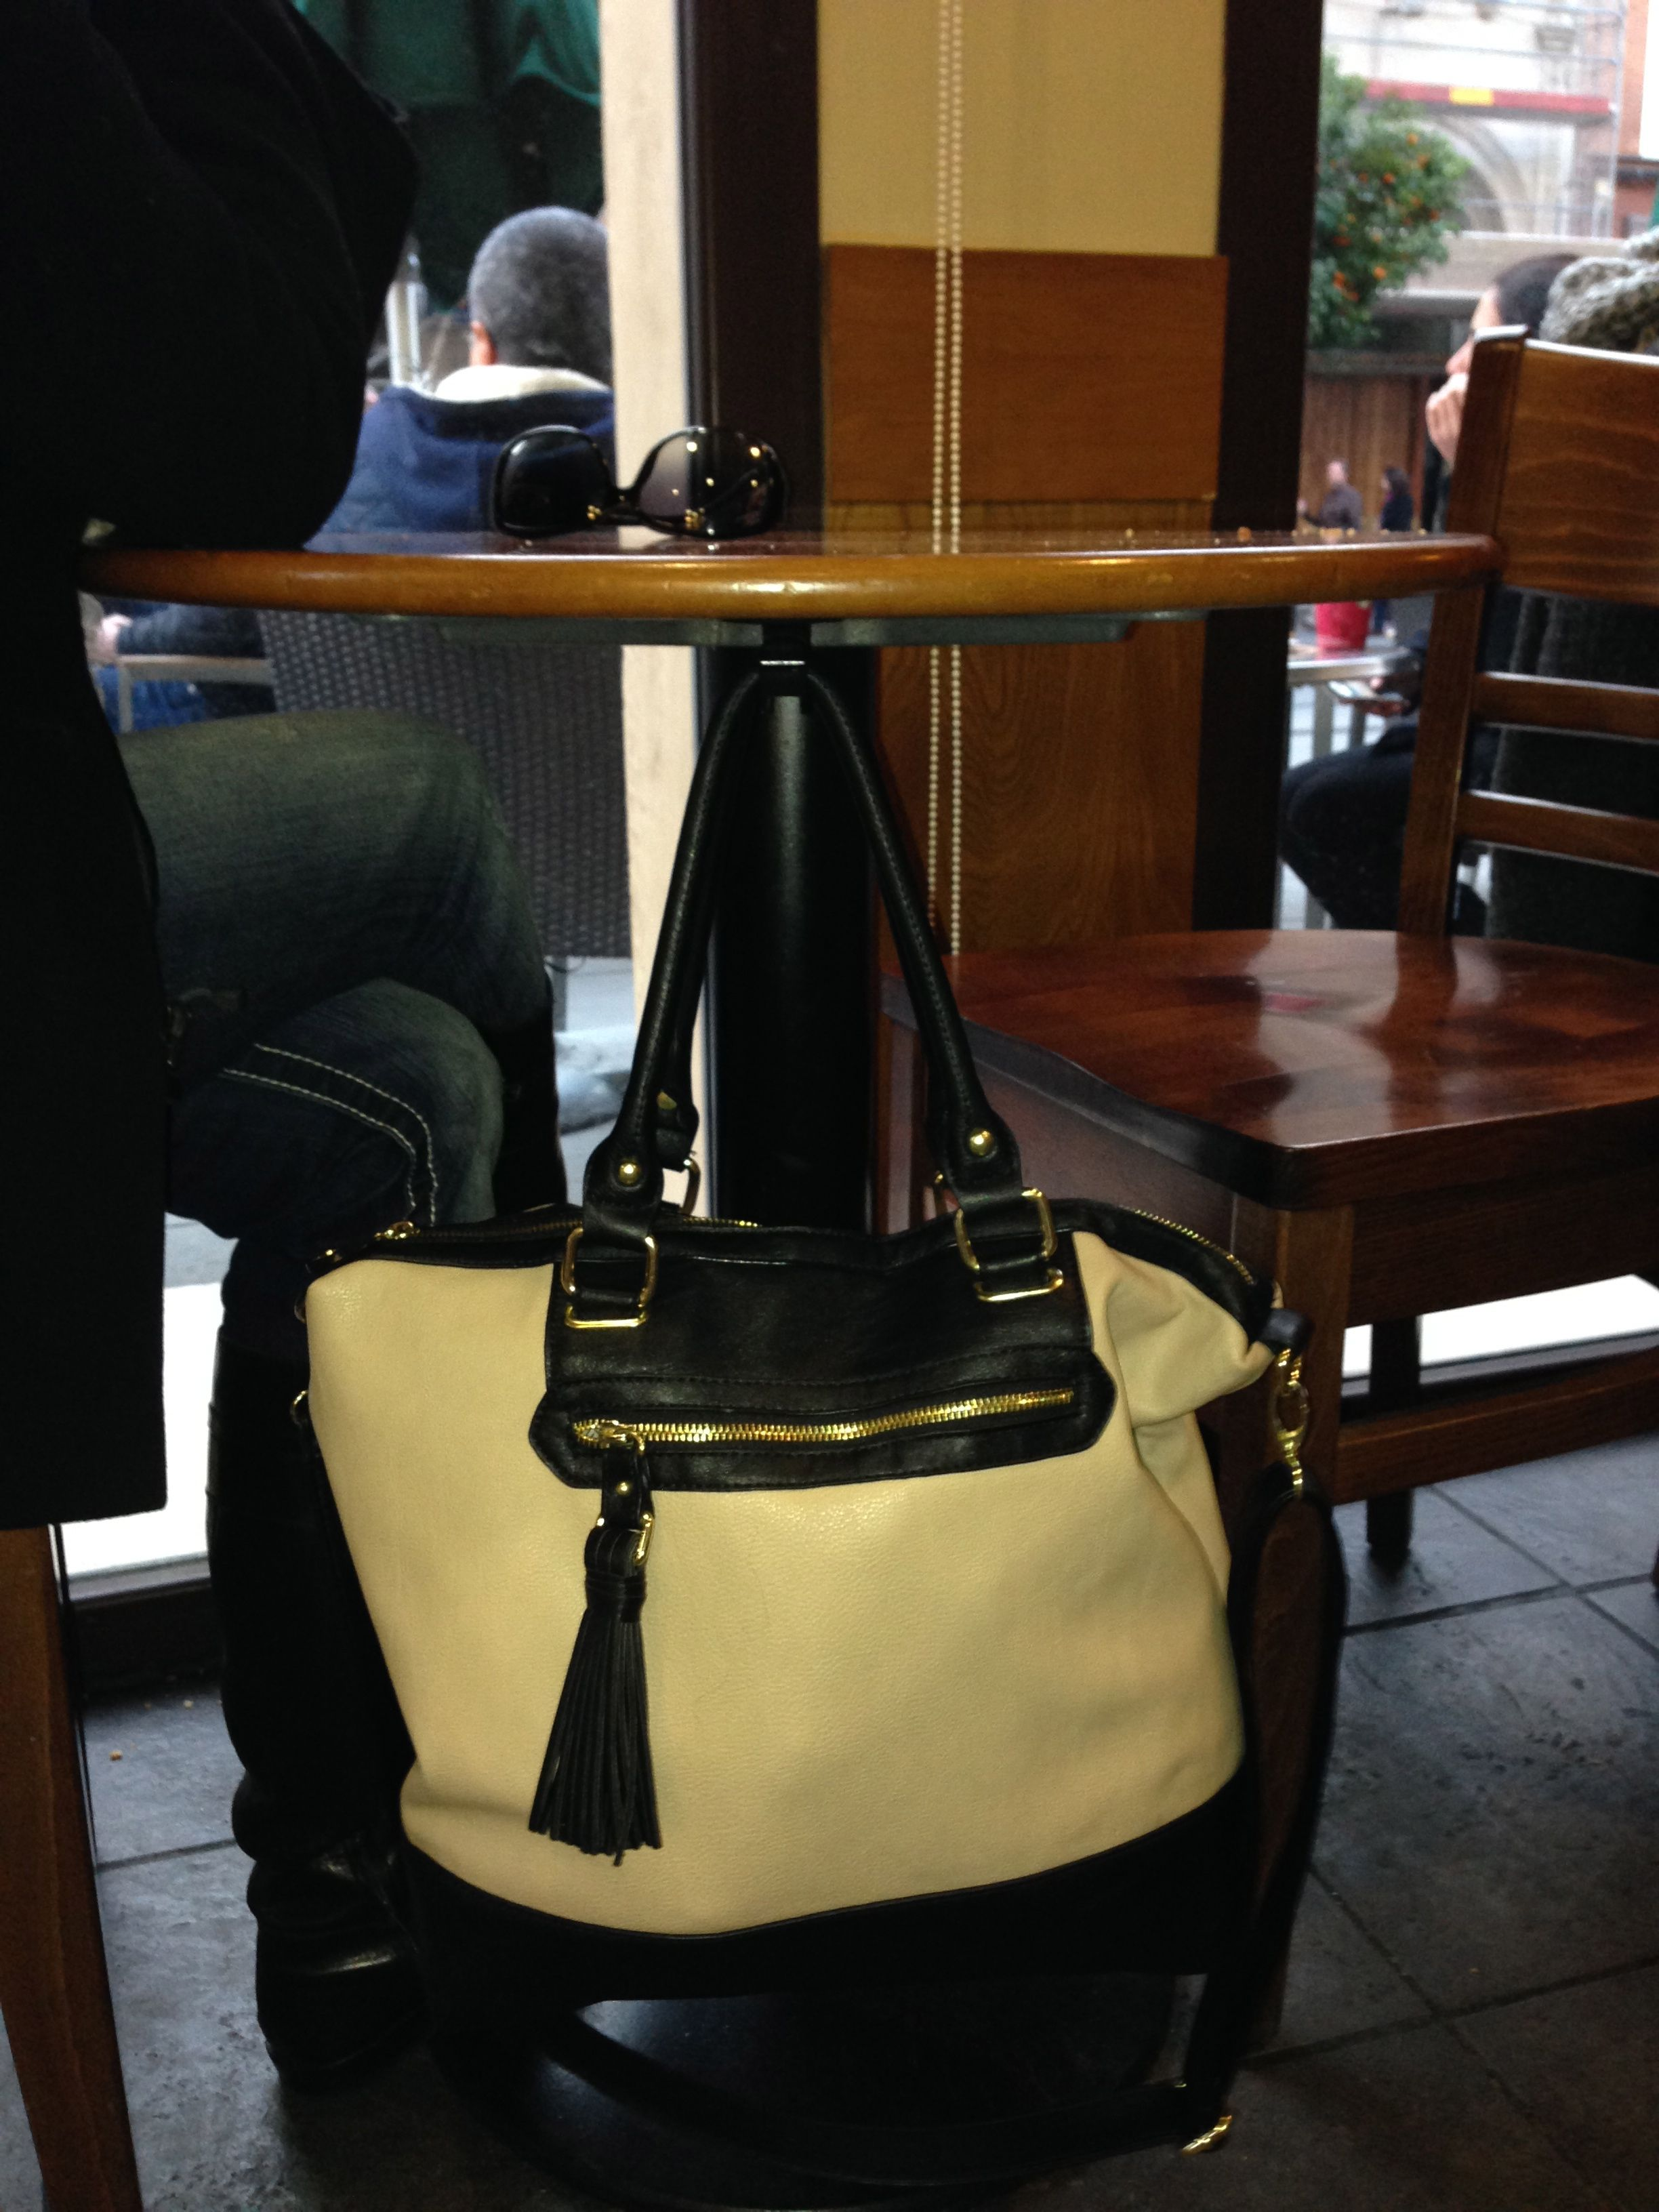 Order Online Www Humphooks Provide Permanent Swivel Purse Hooks For Tables In Restaurants Desks Bar Tops